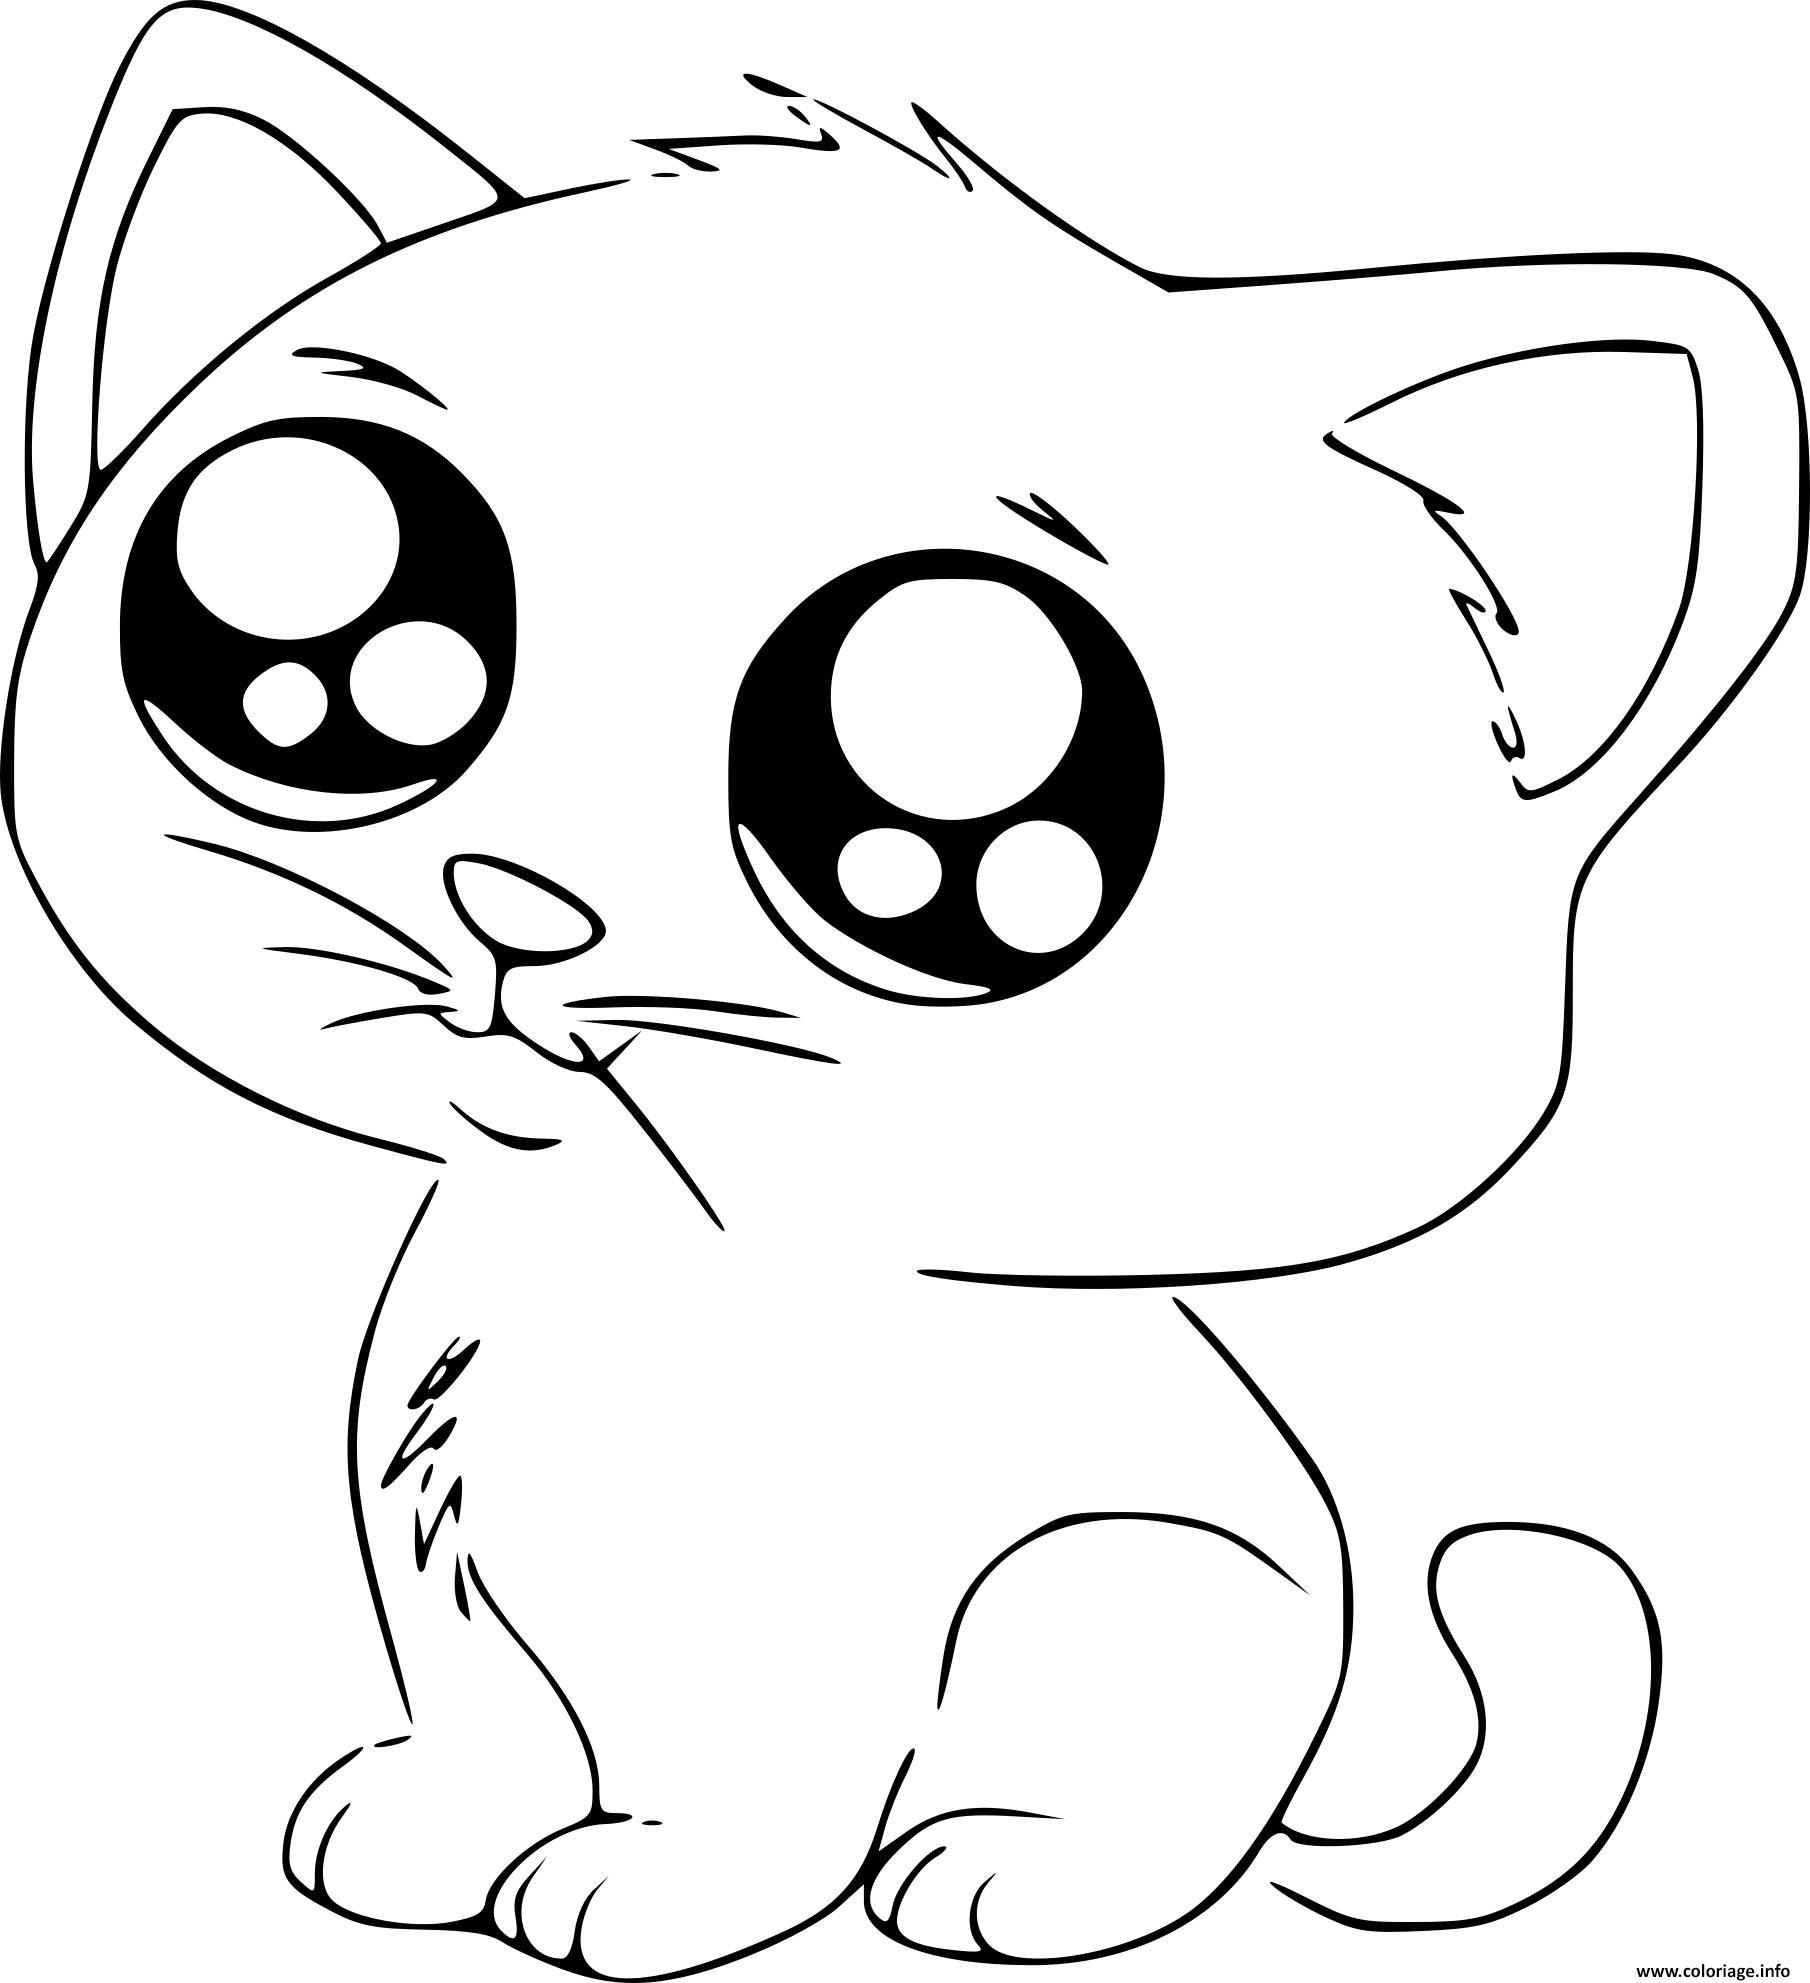 Coloriage a imprimer chatons trop mignon gratuit - Coloriage chaton a imprimer ...